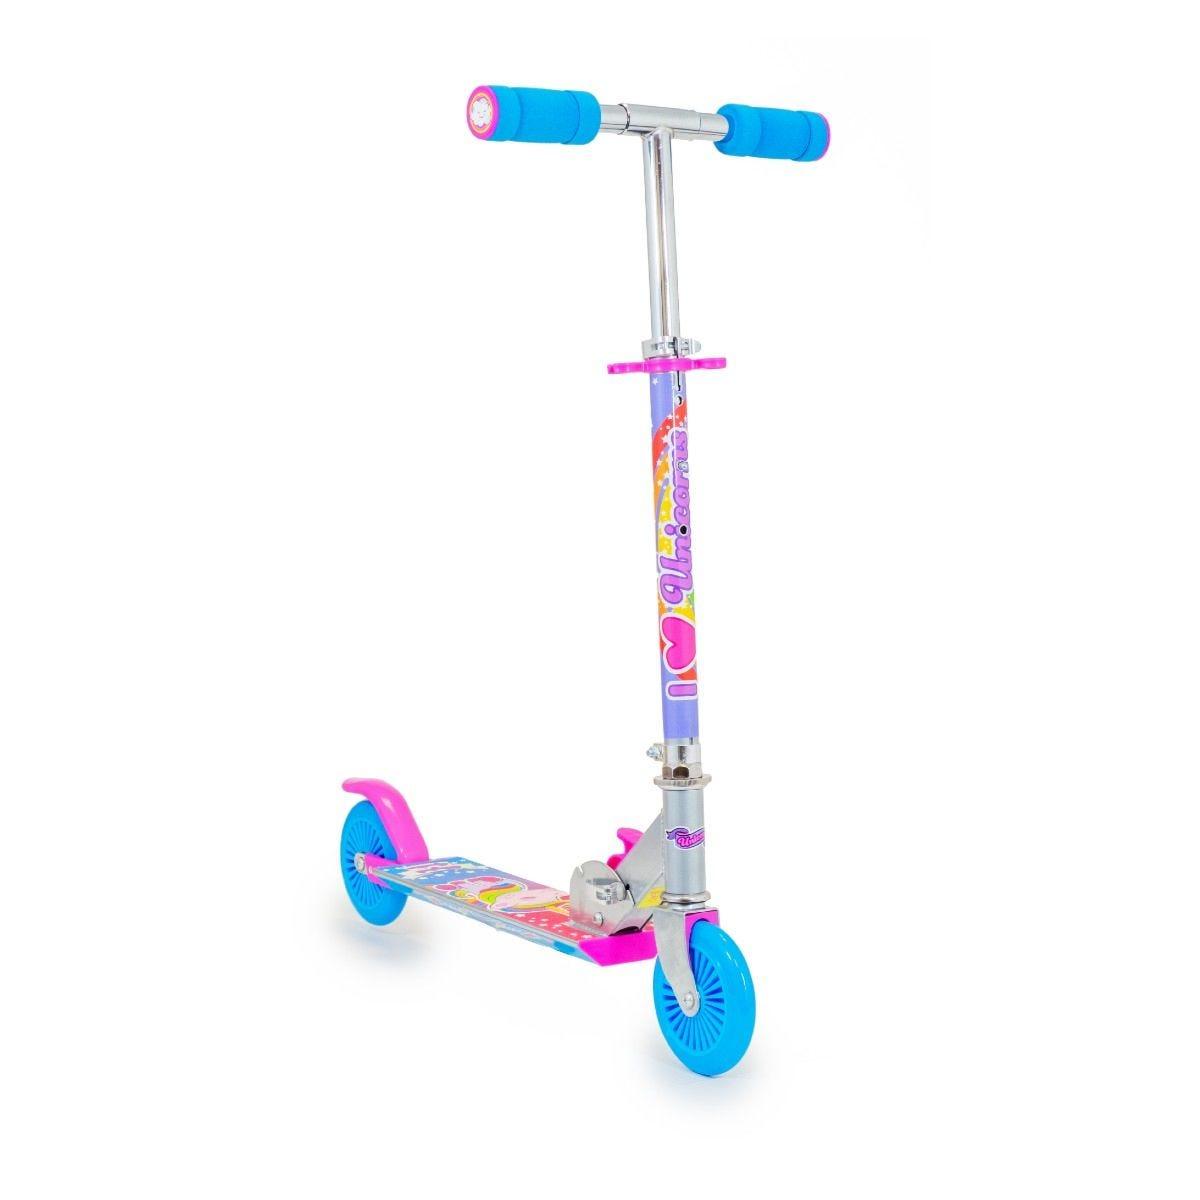 Ozbozz Nebulus Unicorn Scooter